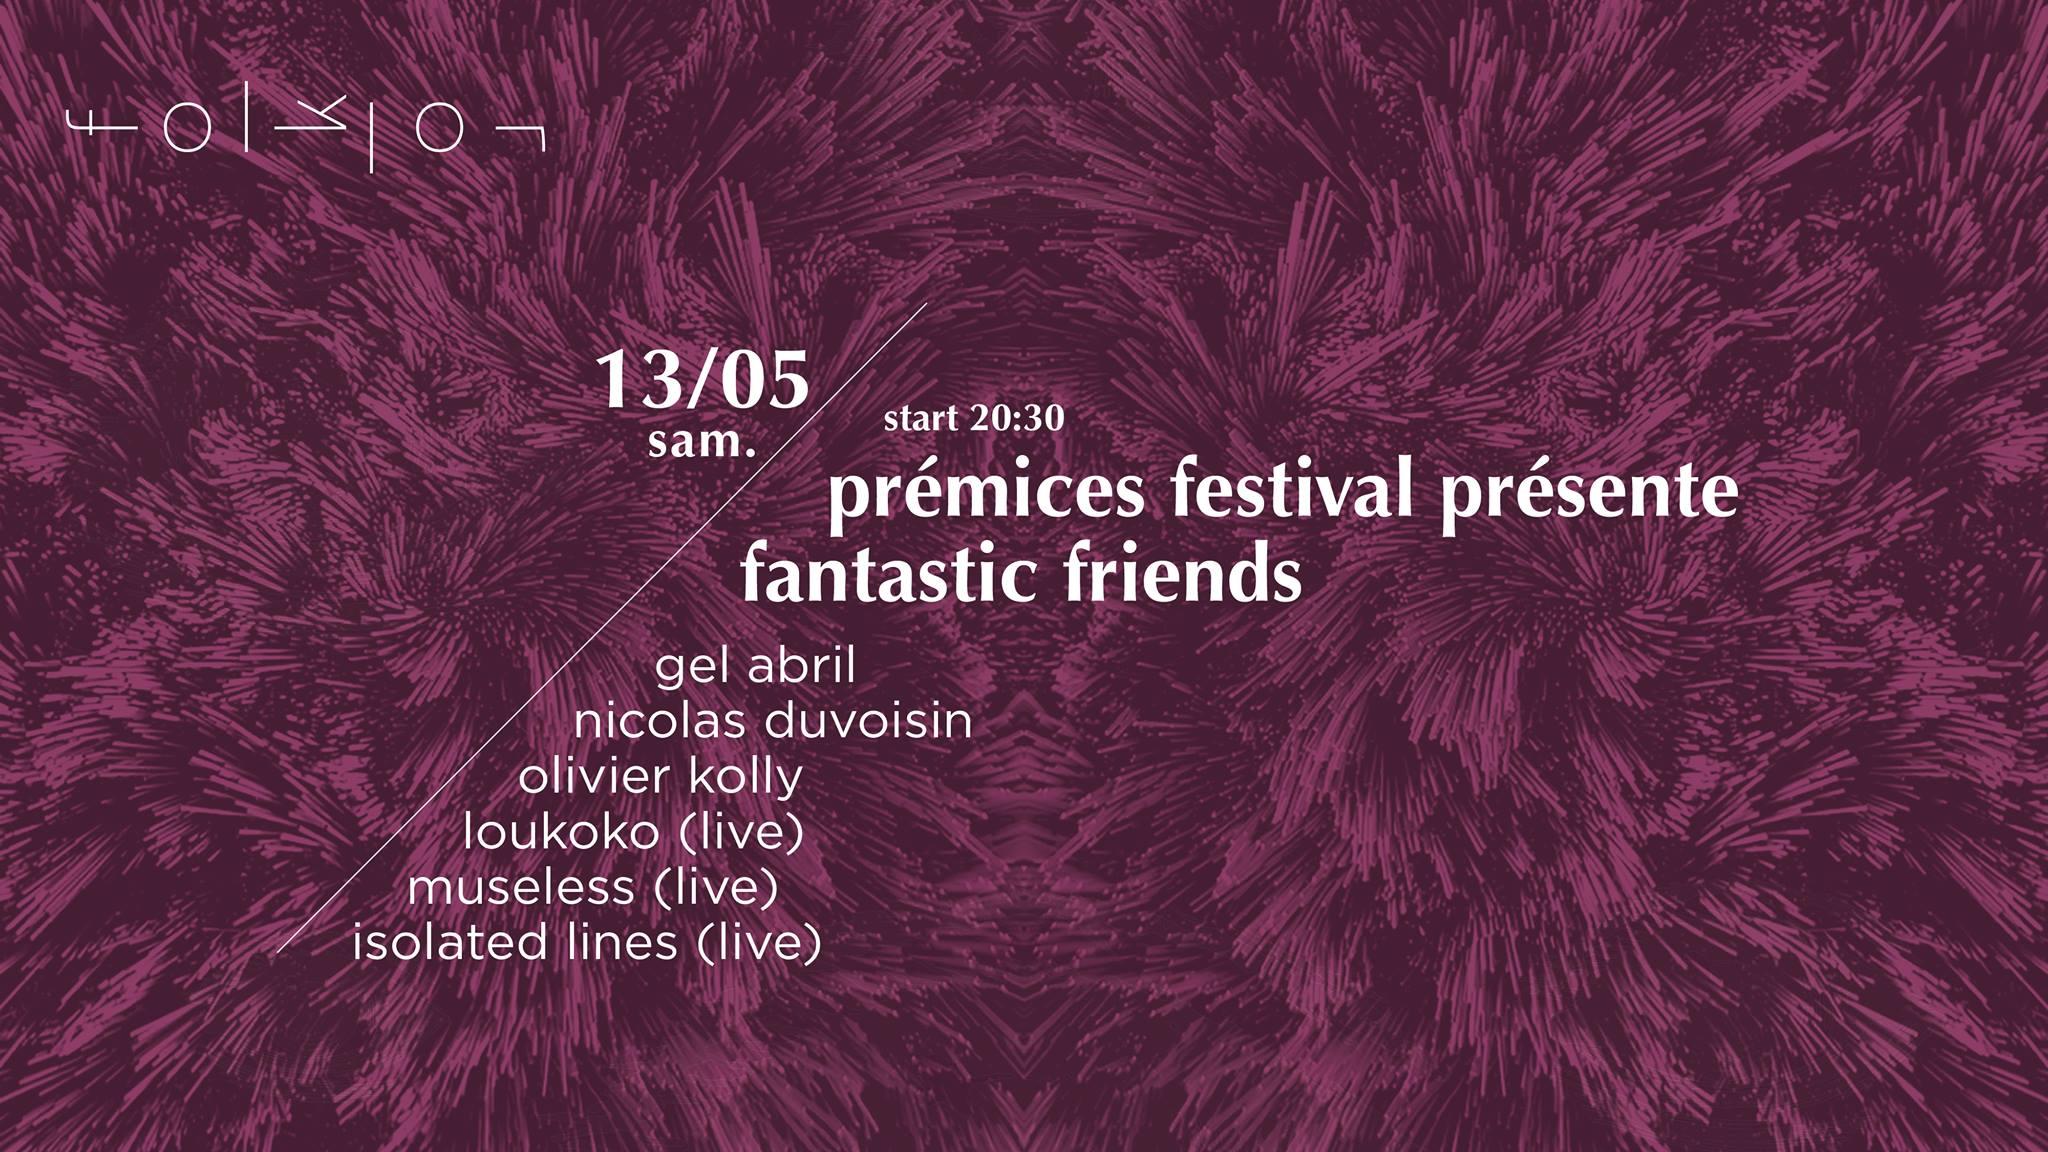 premice_festival_fantastic_friends_gel_abril_nicolas_duvoisin